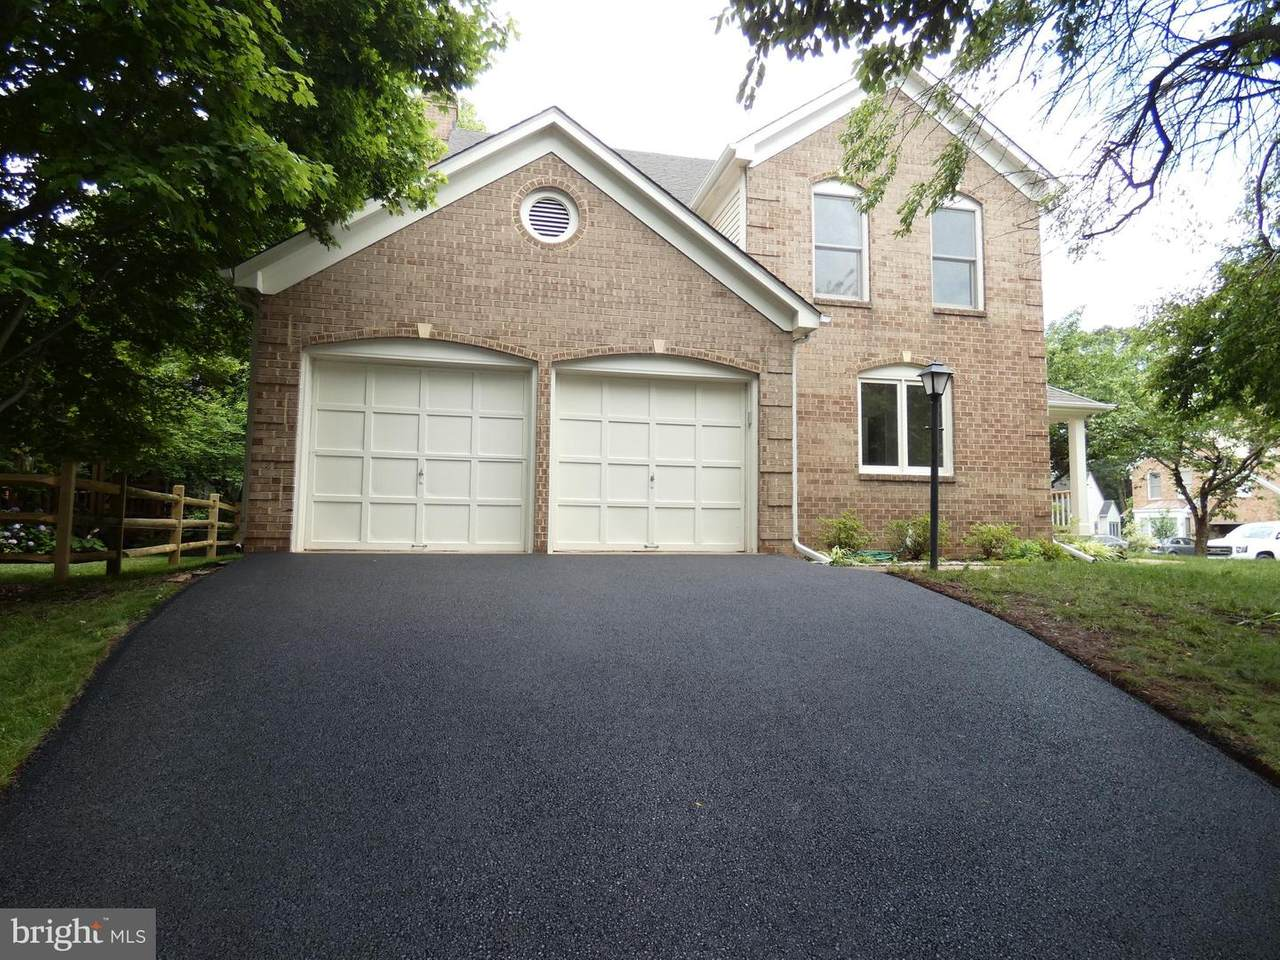 5227 Braywood Drive - Photo 1